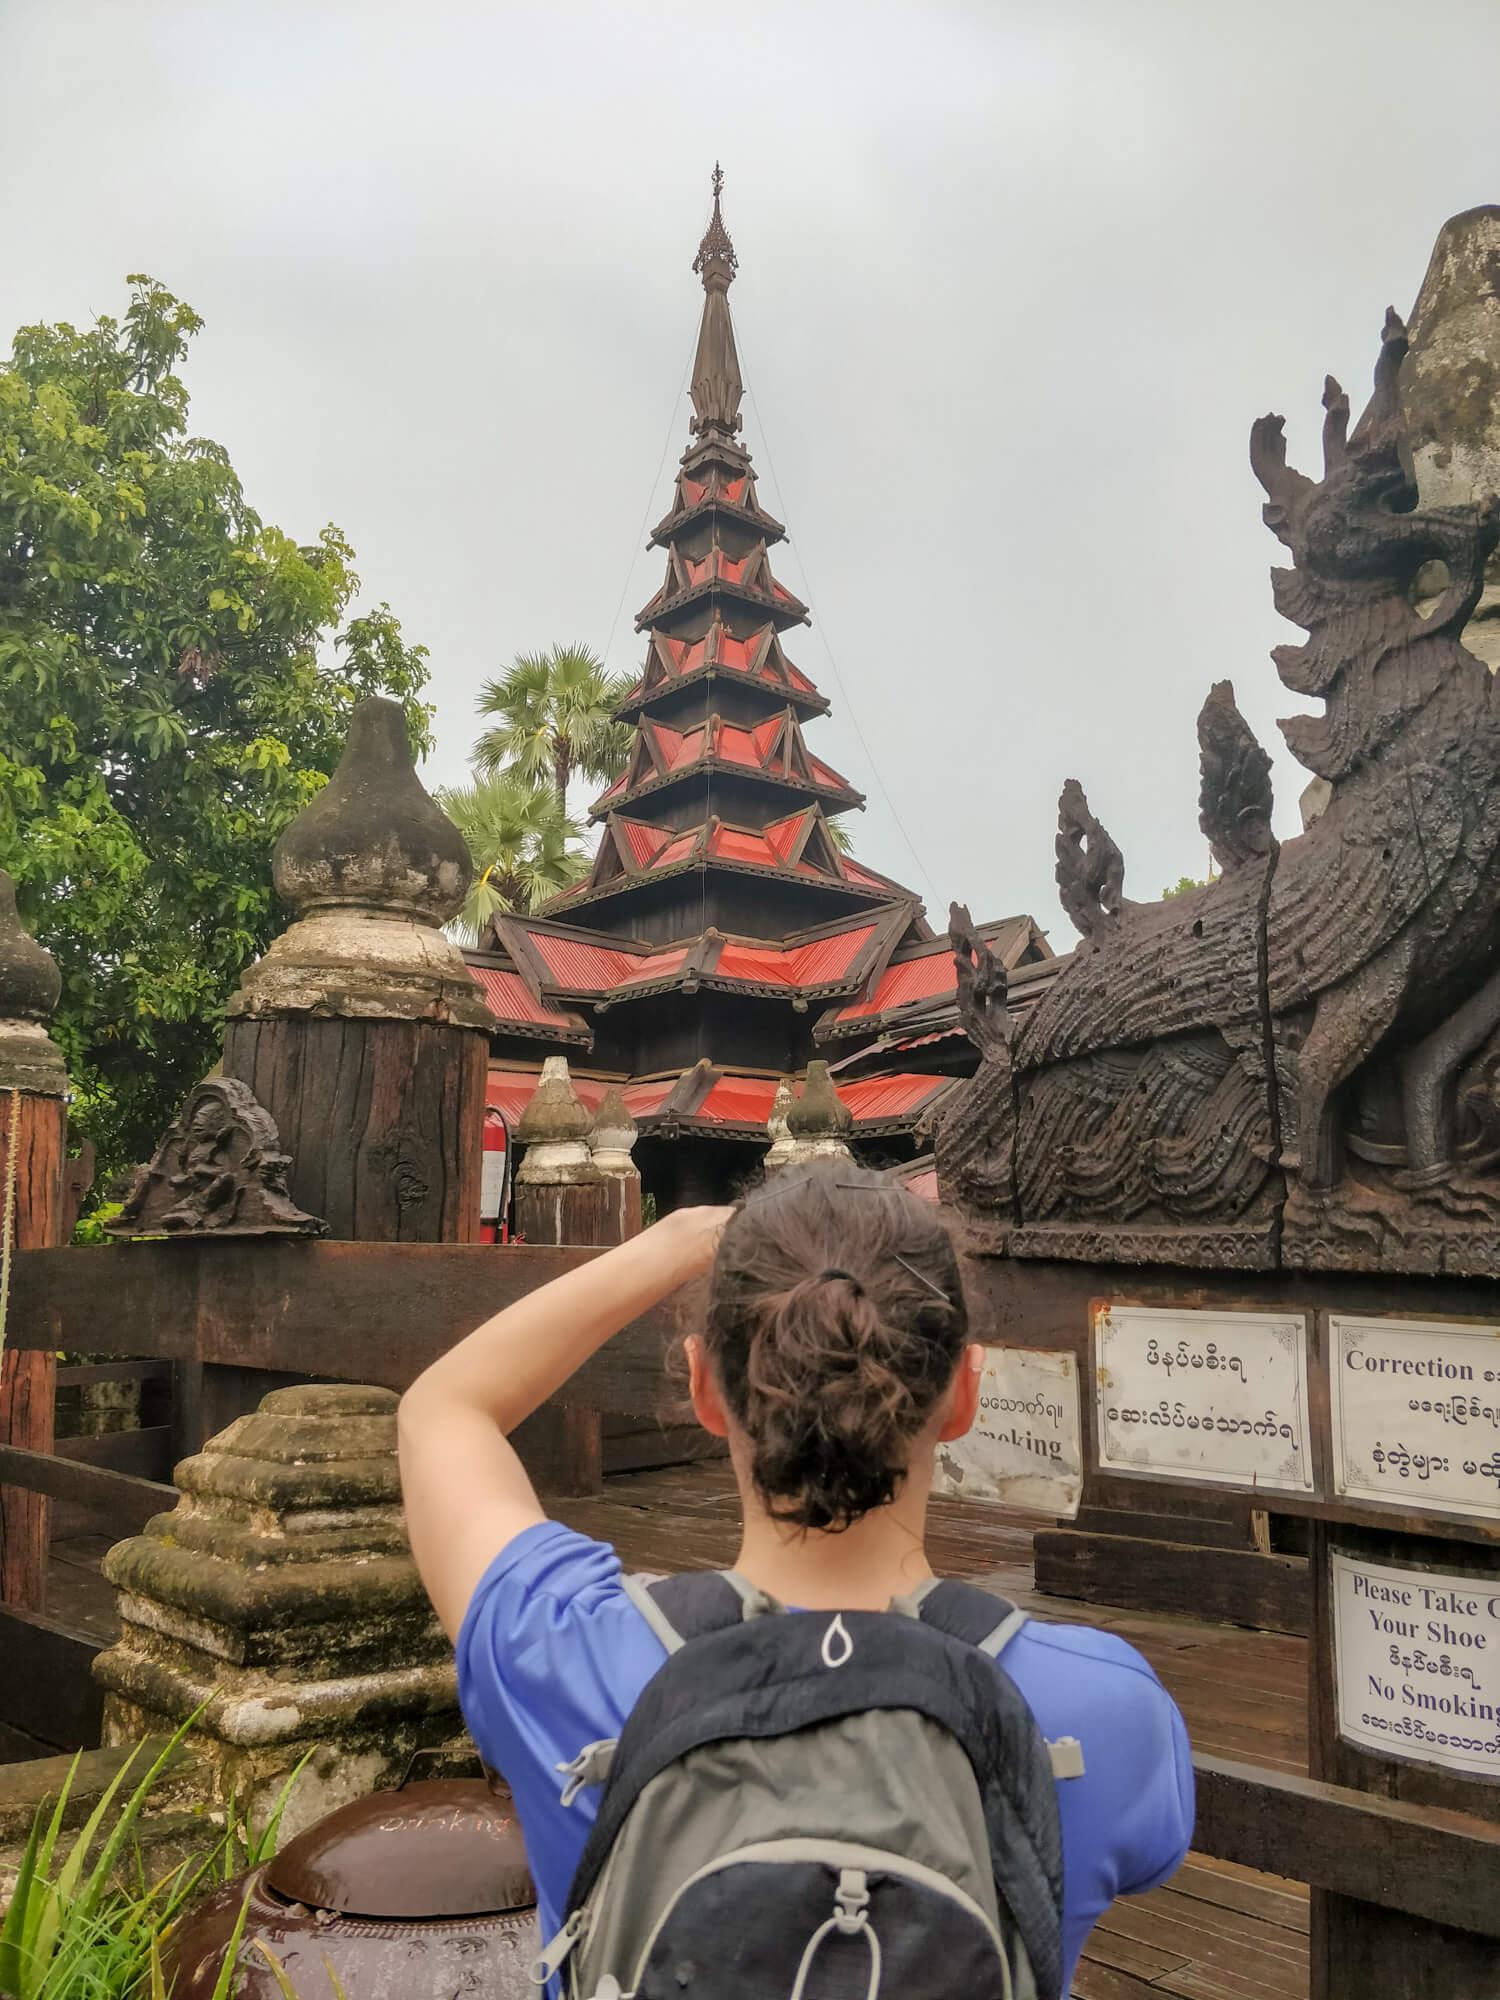 Le célèbre toit du monastère Bagaya